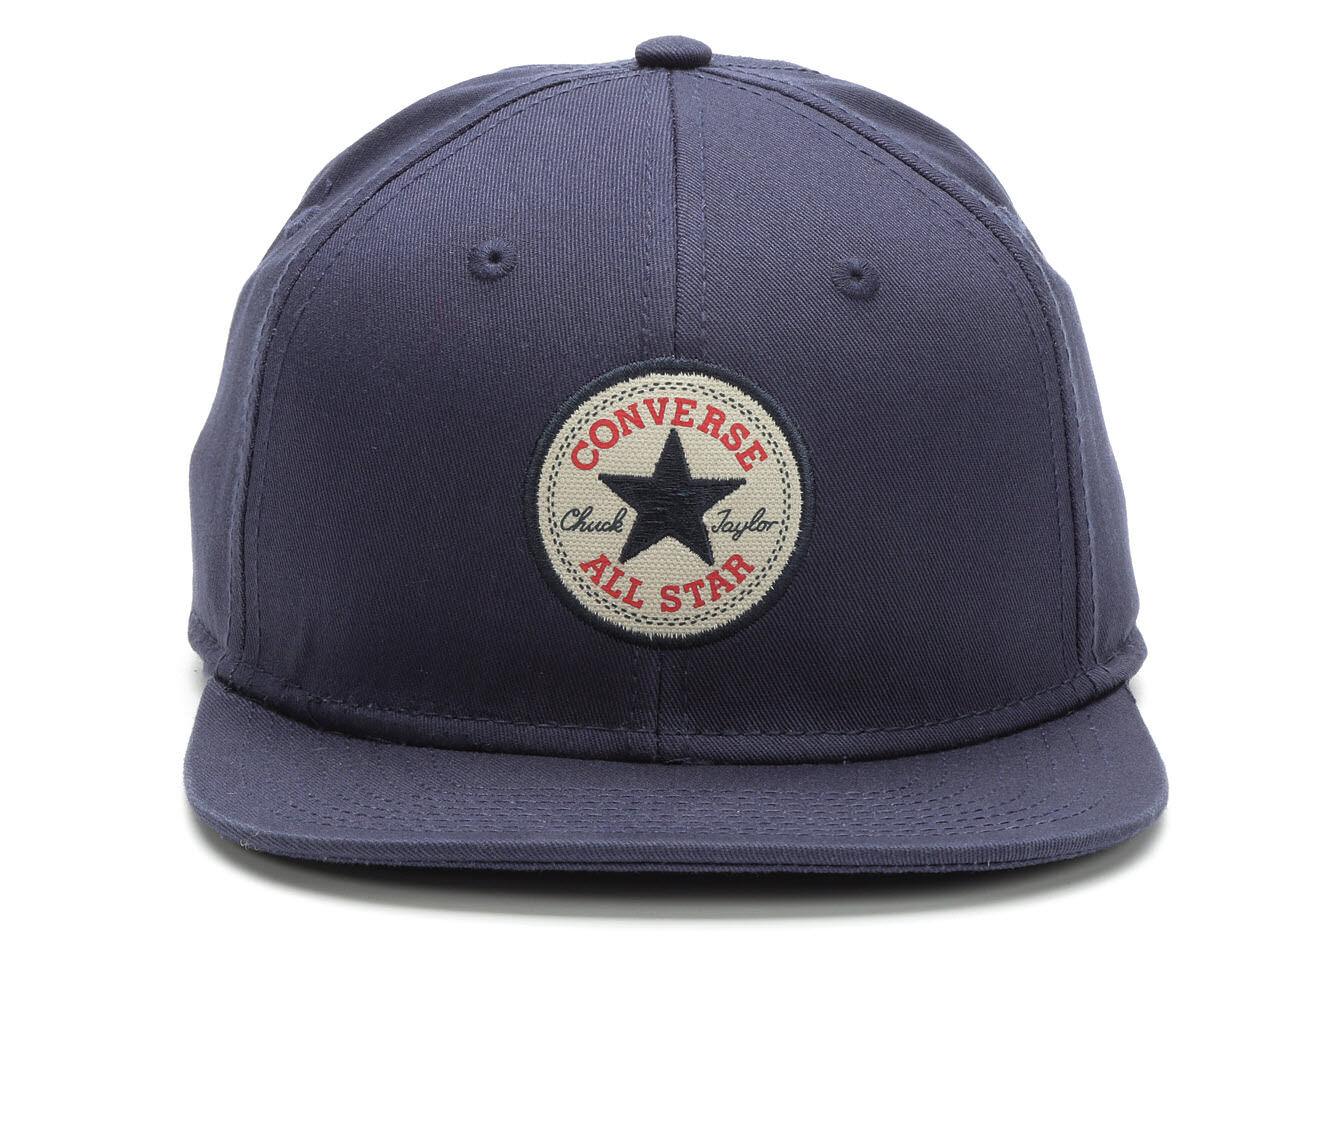 converse snapback hat